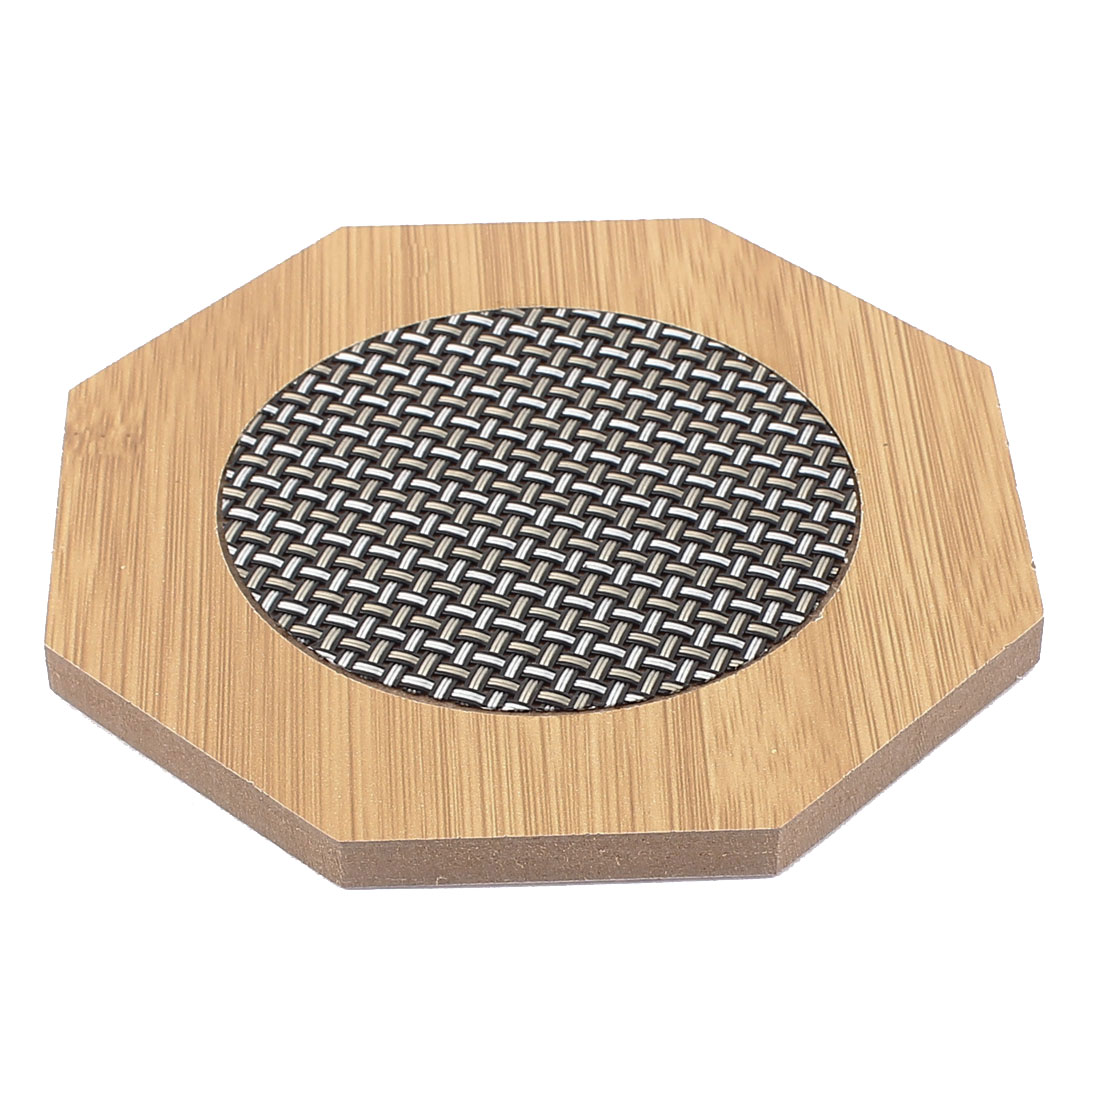 Household Wooden Octagon Shape Heat Resistant Mat Cup Pot Coaster Pad